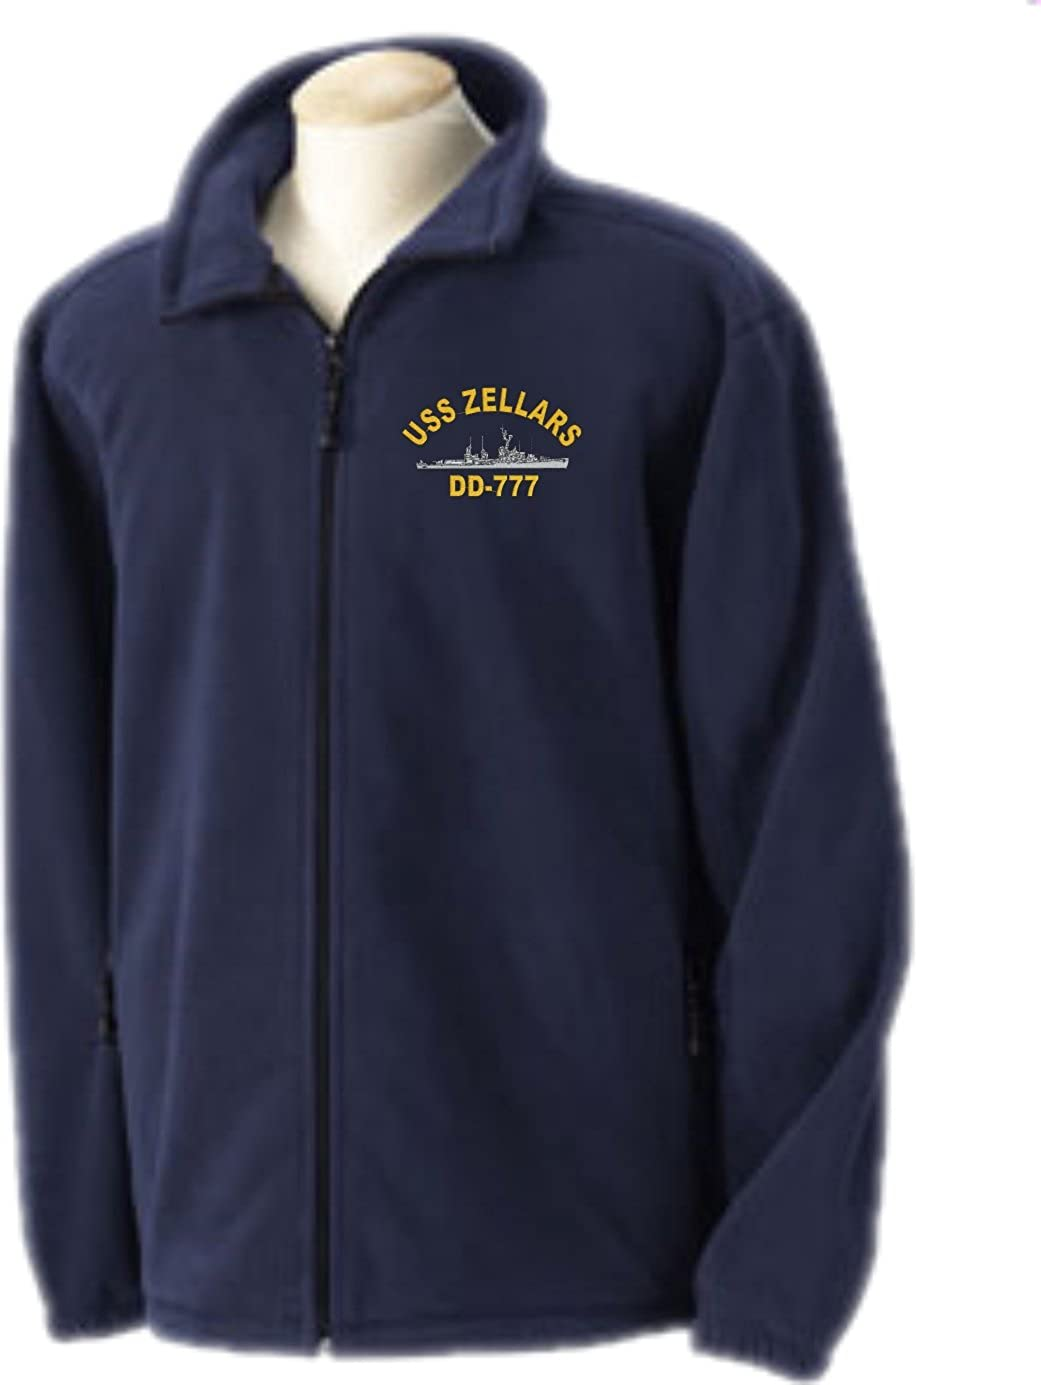 Custom Military Apparel USS Zellars DD-777 Embroidered Fleece Jacket Sizes Small-4X